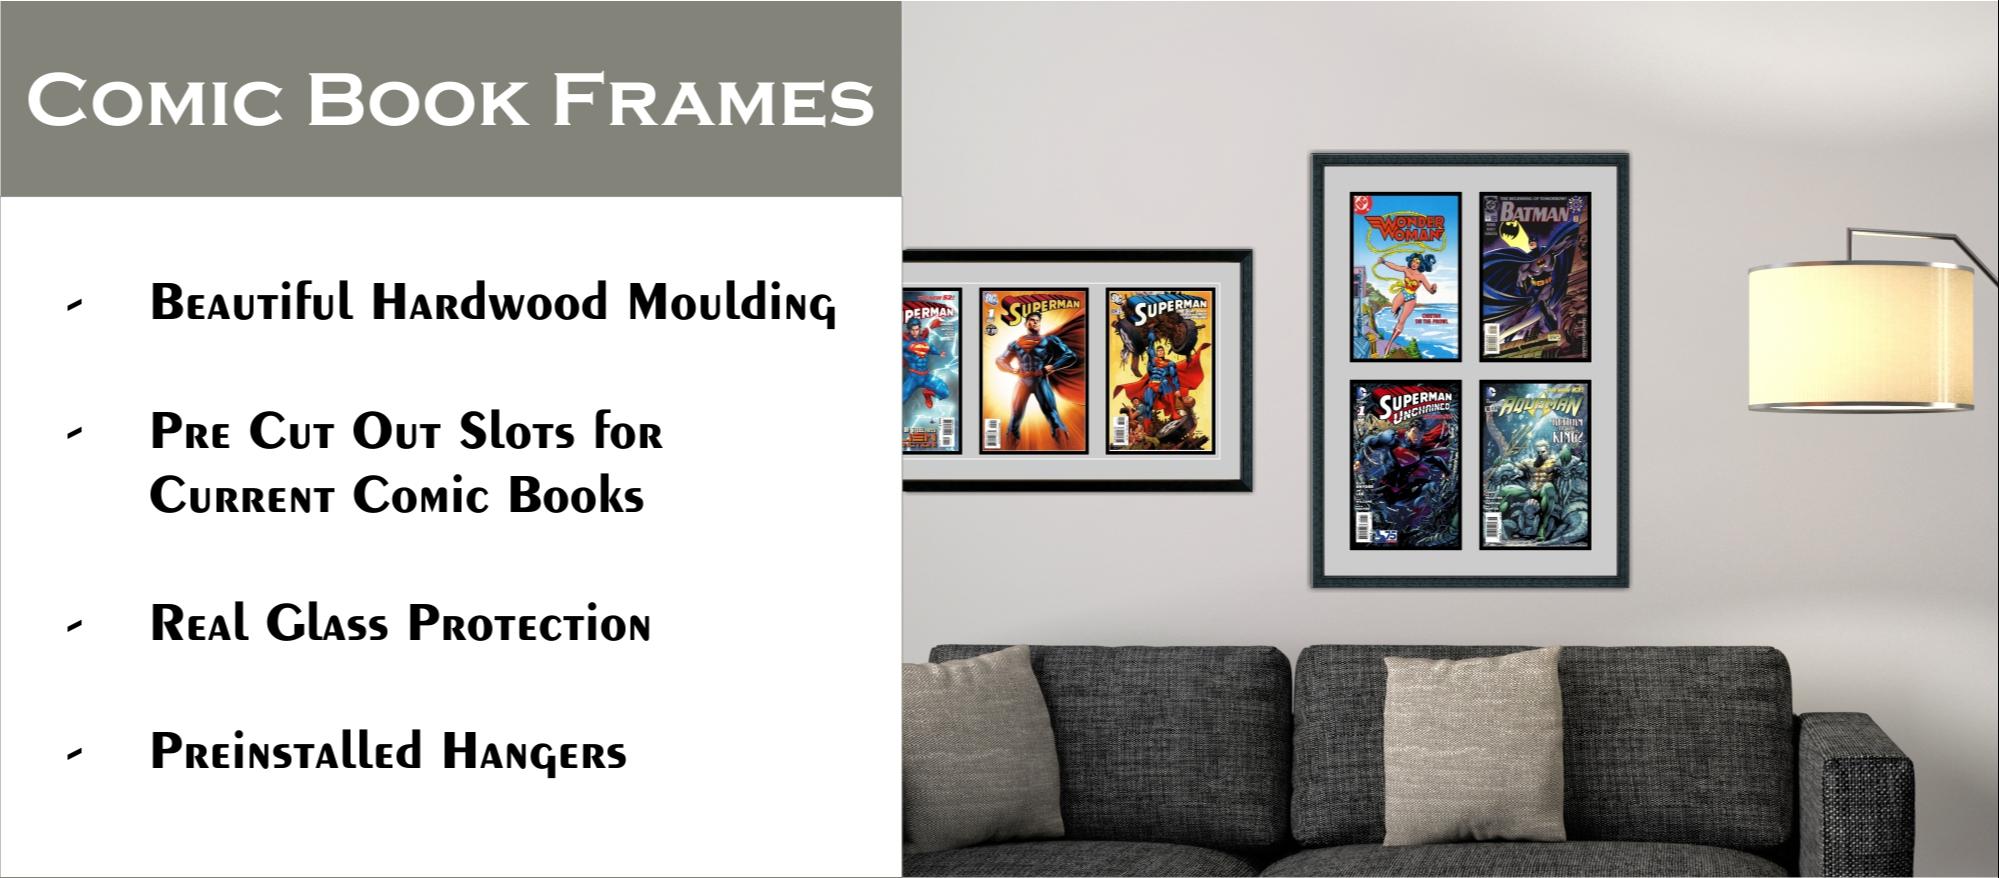 Comic Book Frames